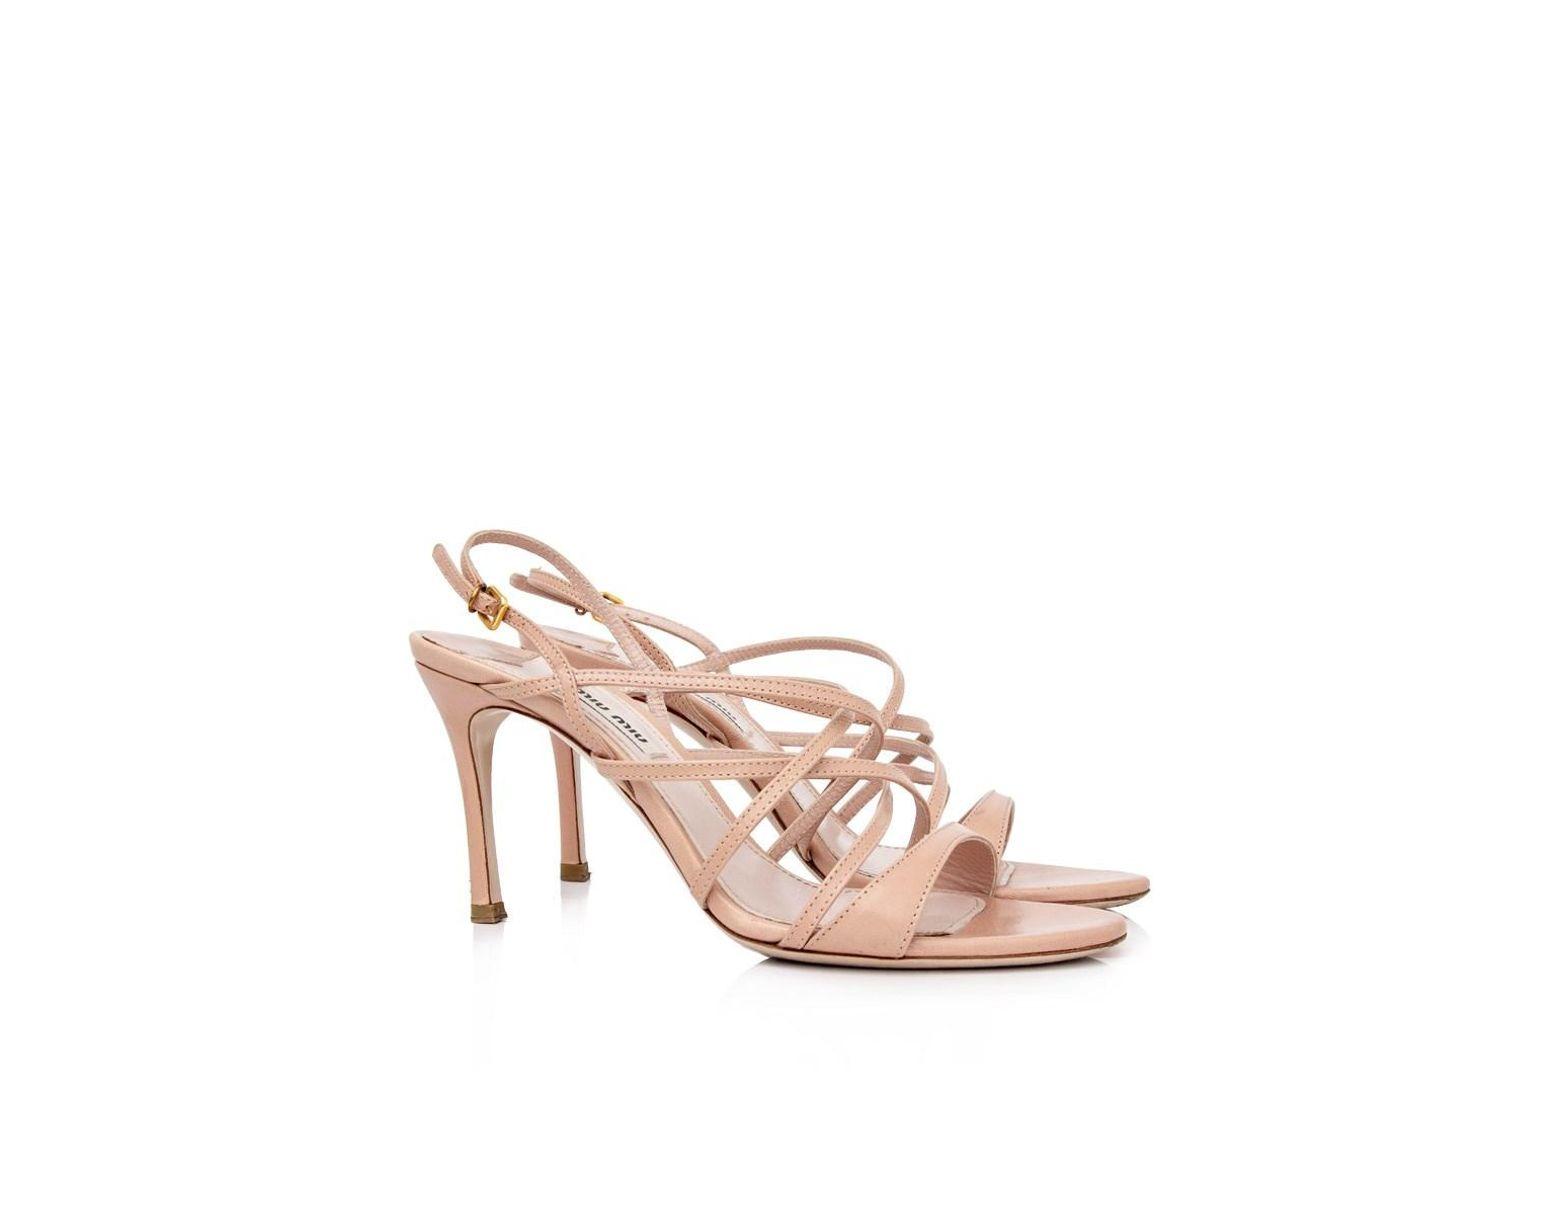 Miu Miu Pink Satin Jewel Embellished High Heel Sandals